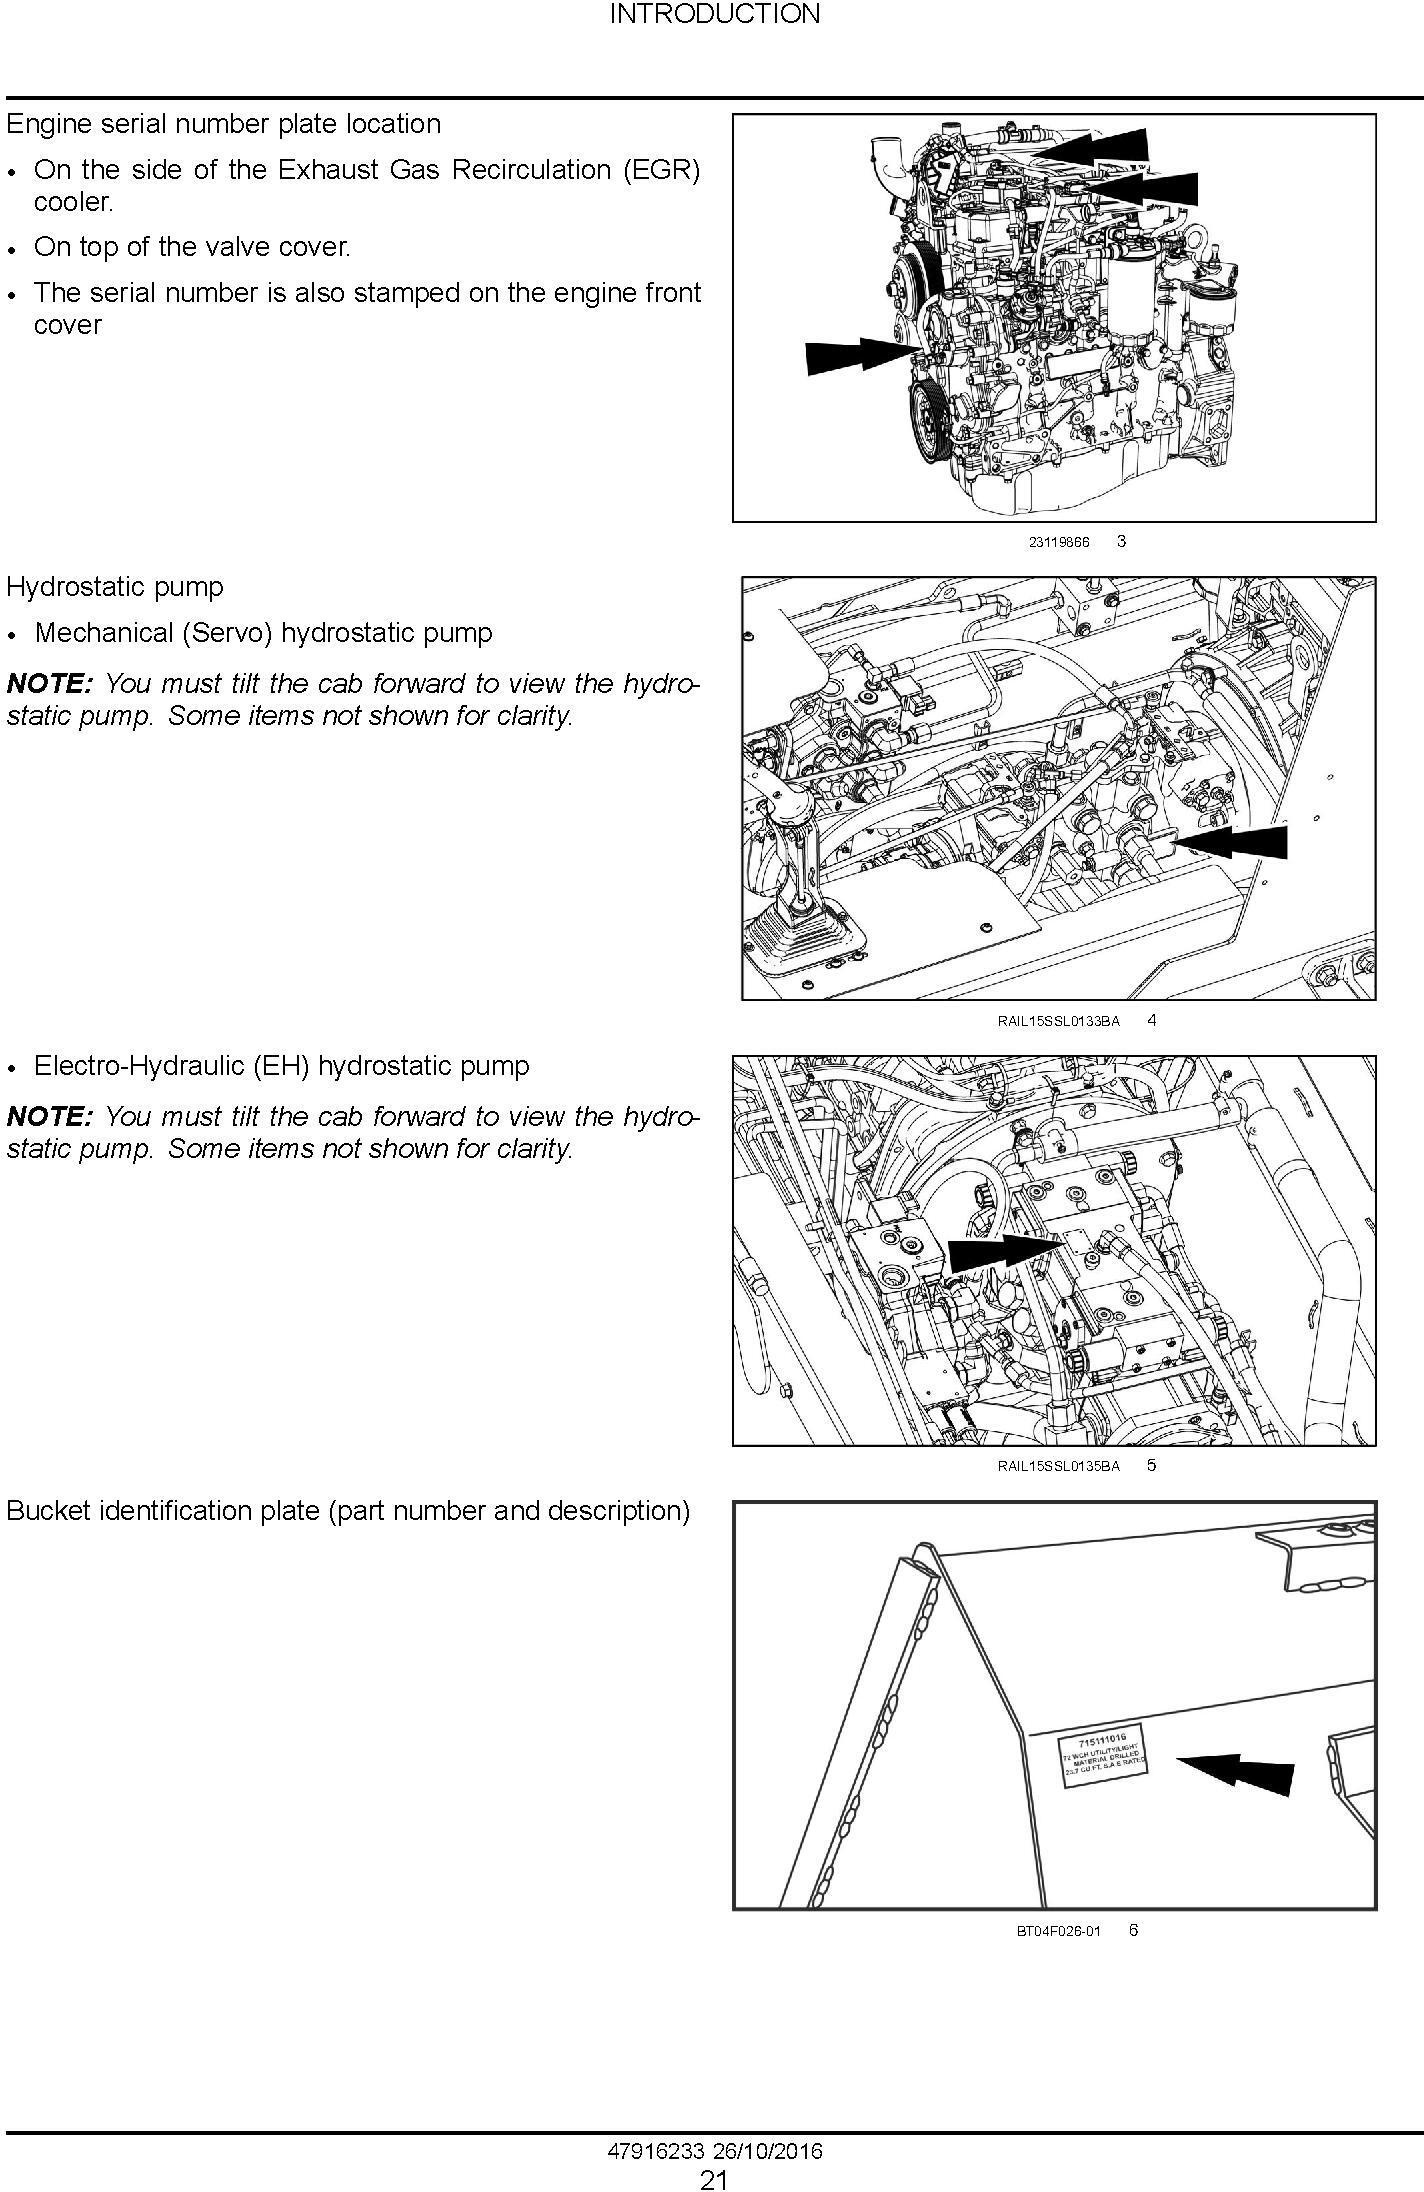 New Holland L234 Skid Steer Loader C238 Compact Track